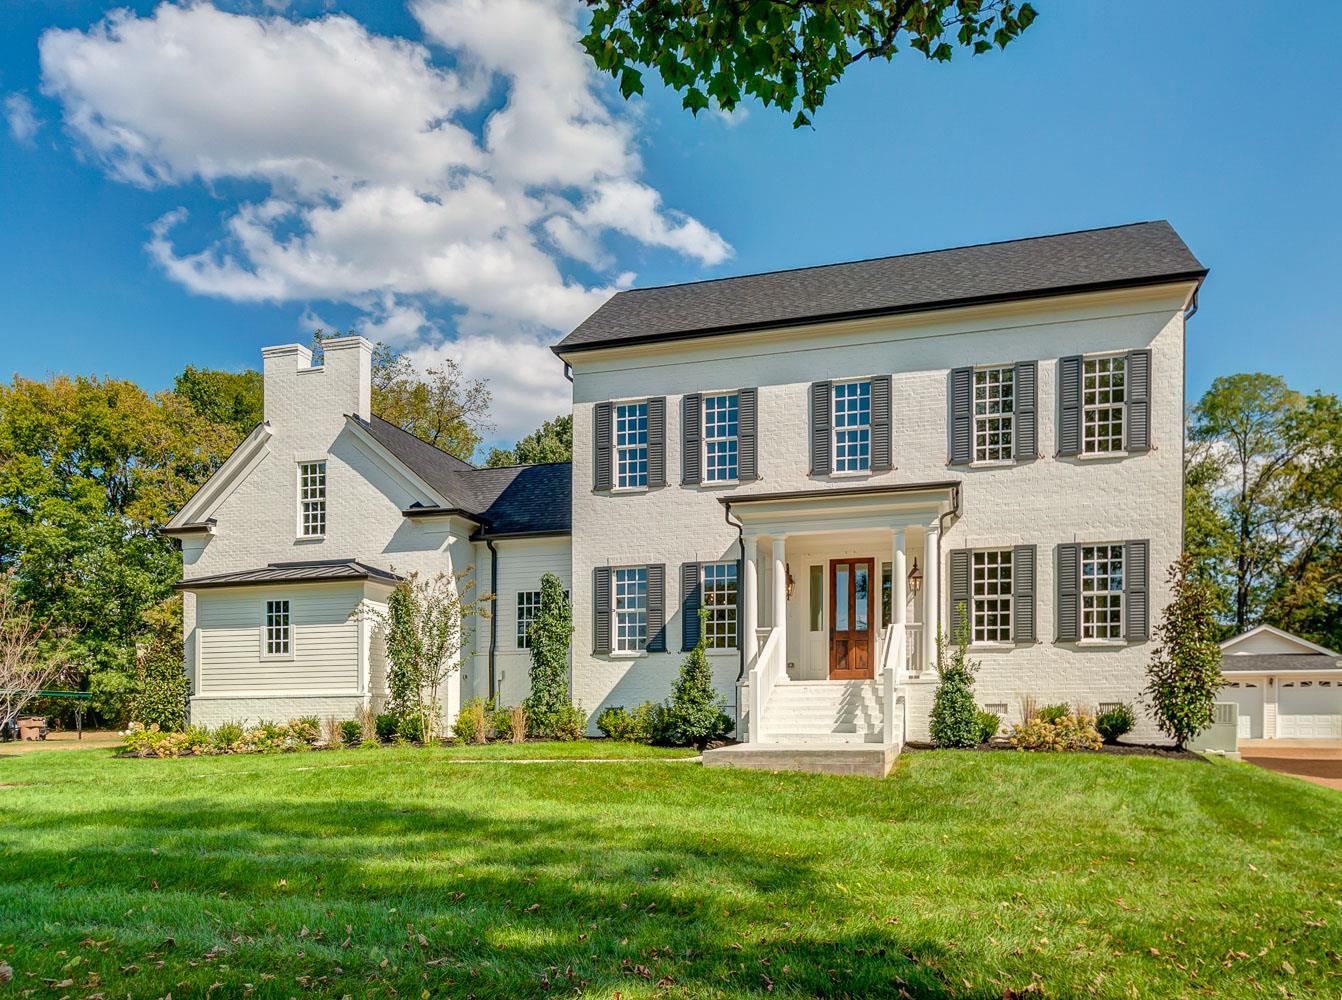 606 Estes Rd, Nashville, TN 37215 - Nashville, TN real estate listing